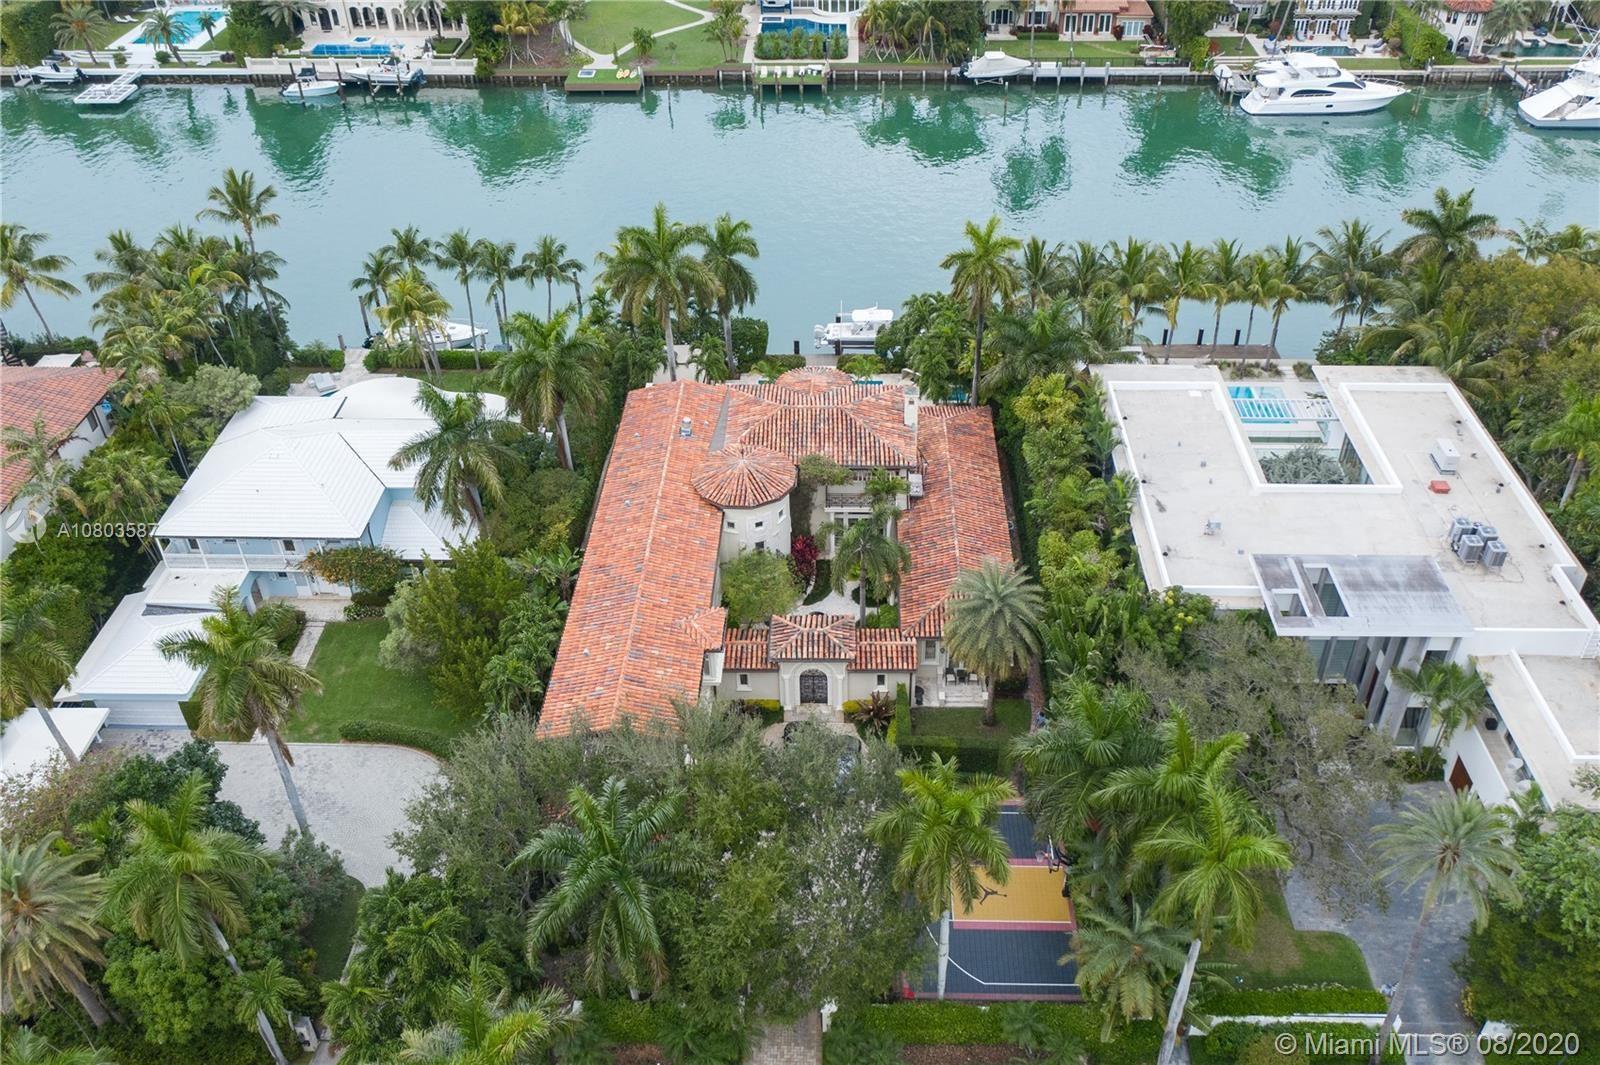 Photo 68 of Listing MLS a10803587 in 1511 W 27th St Miami Beach FL 33140